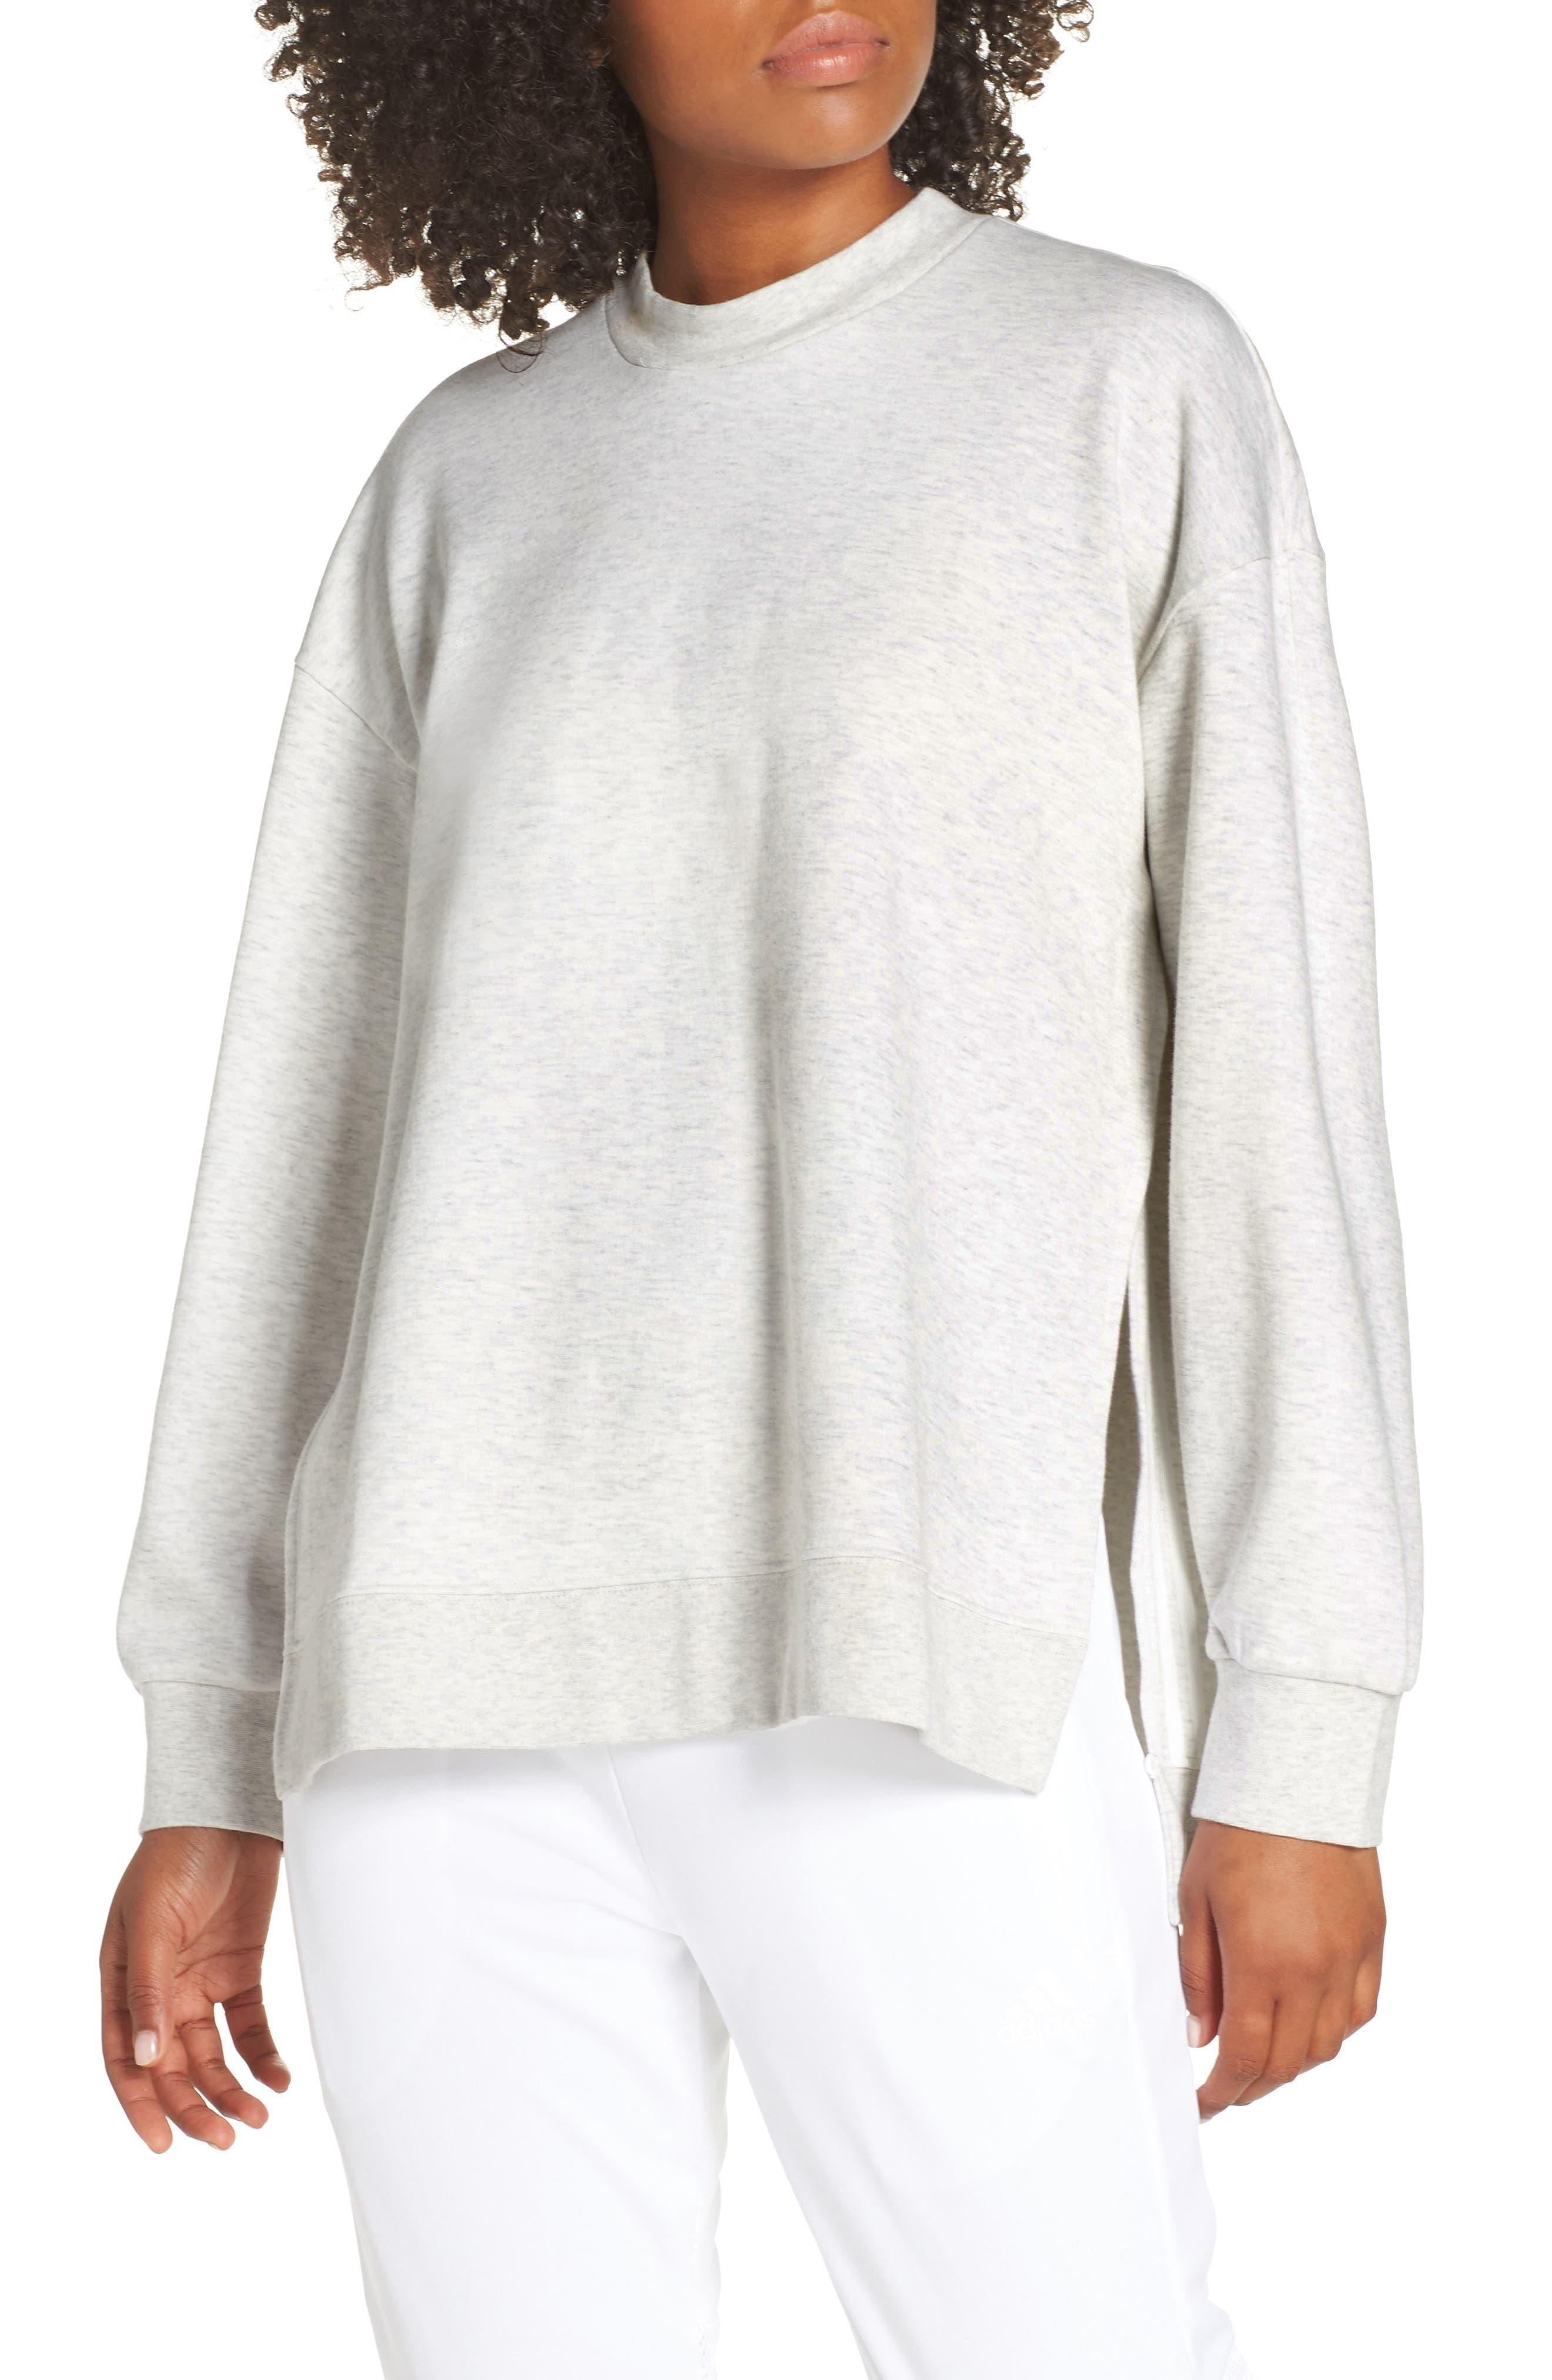 Adidas Wanderlust Second Layer Sweatshirt